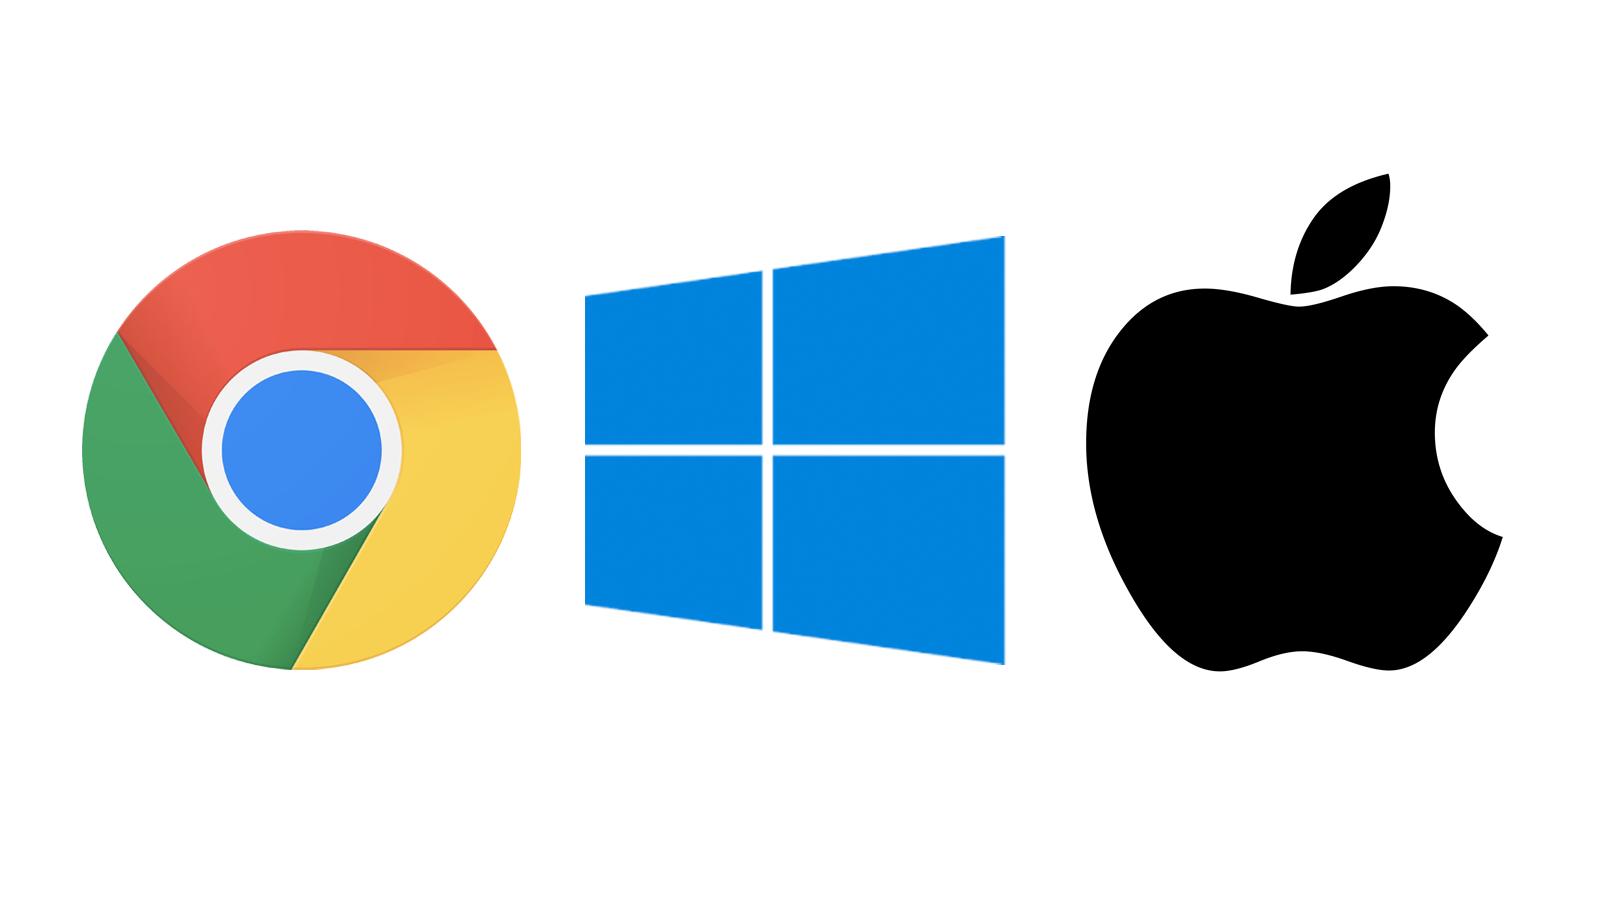 Google, Microsoft, and Apple logos.